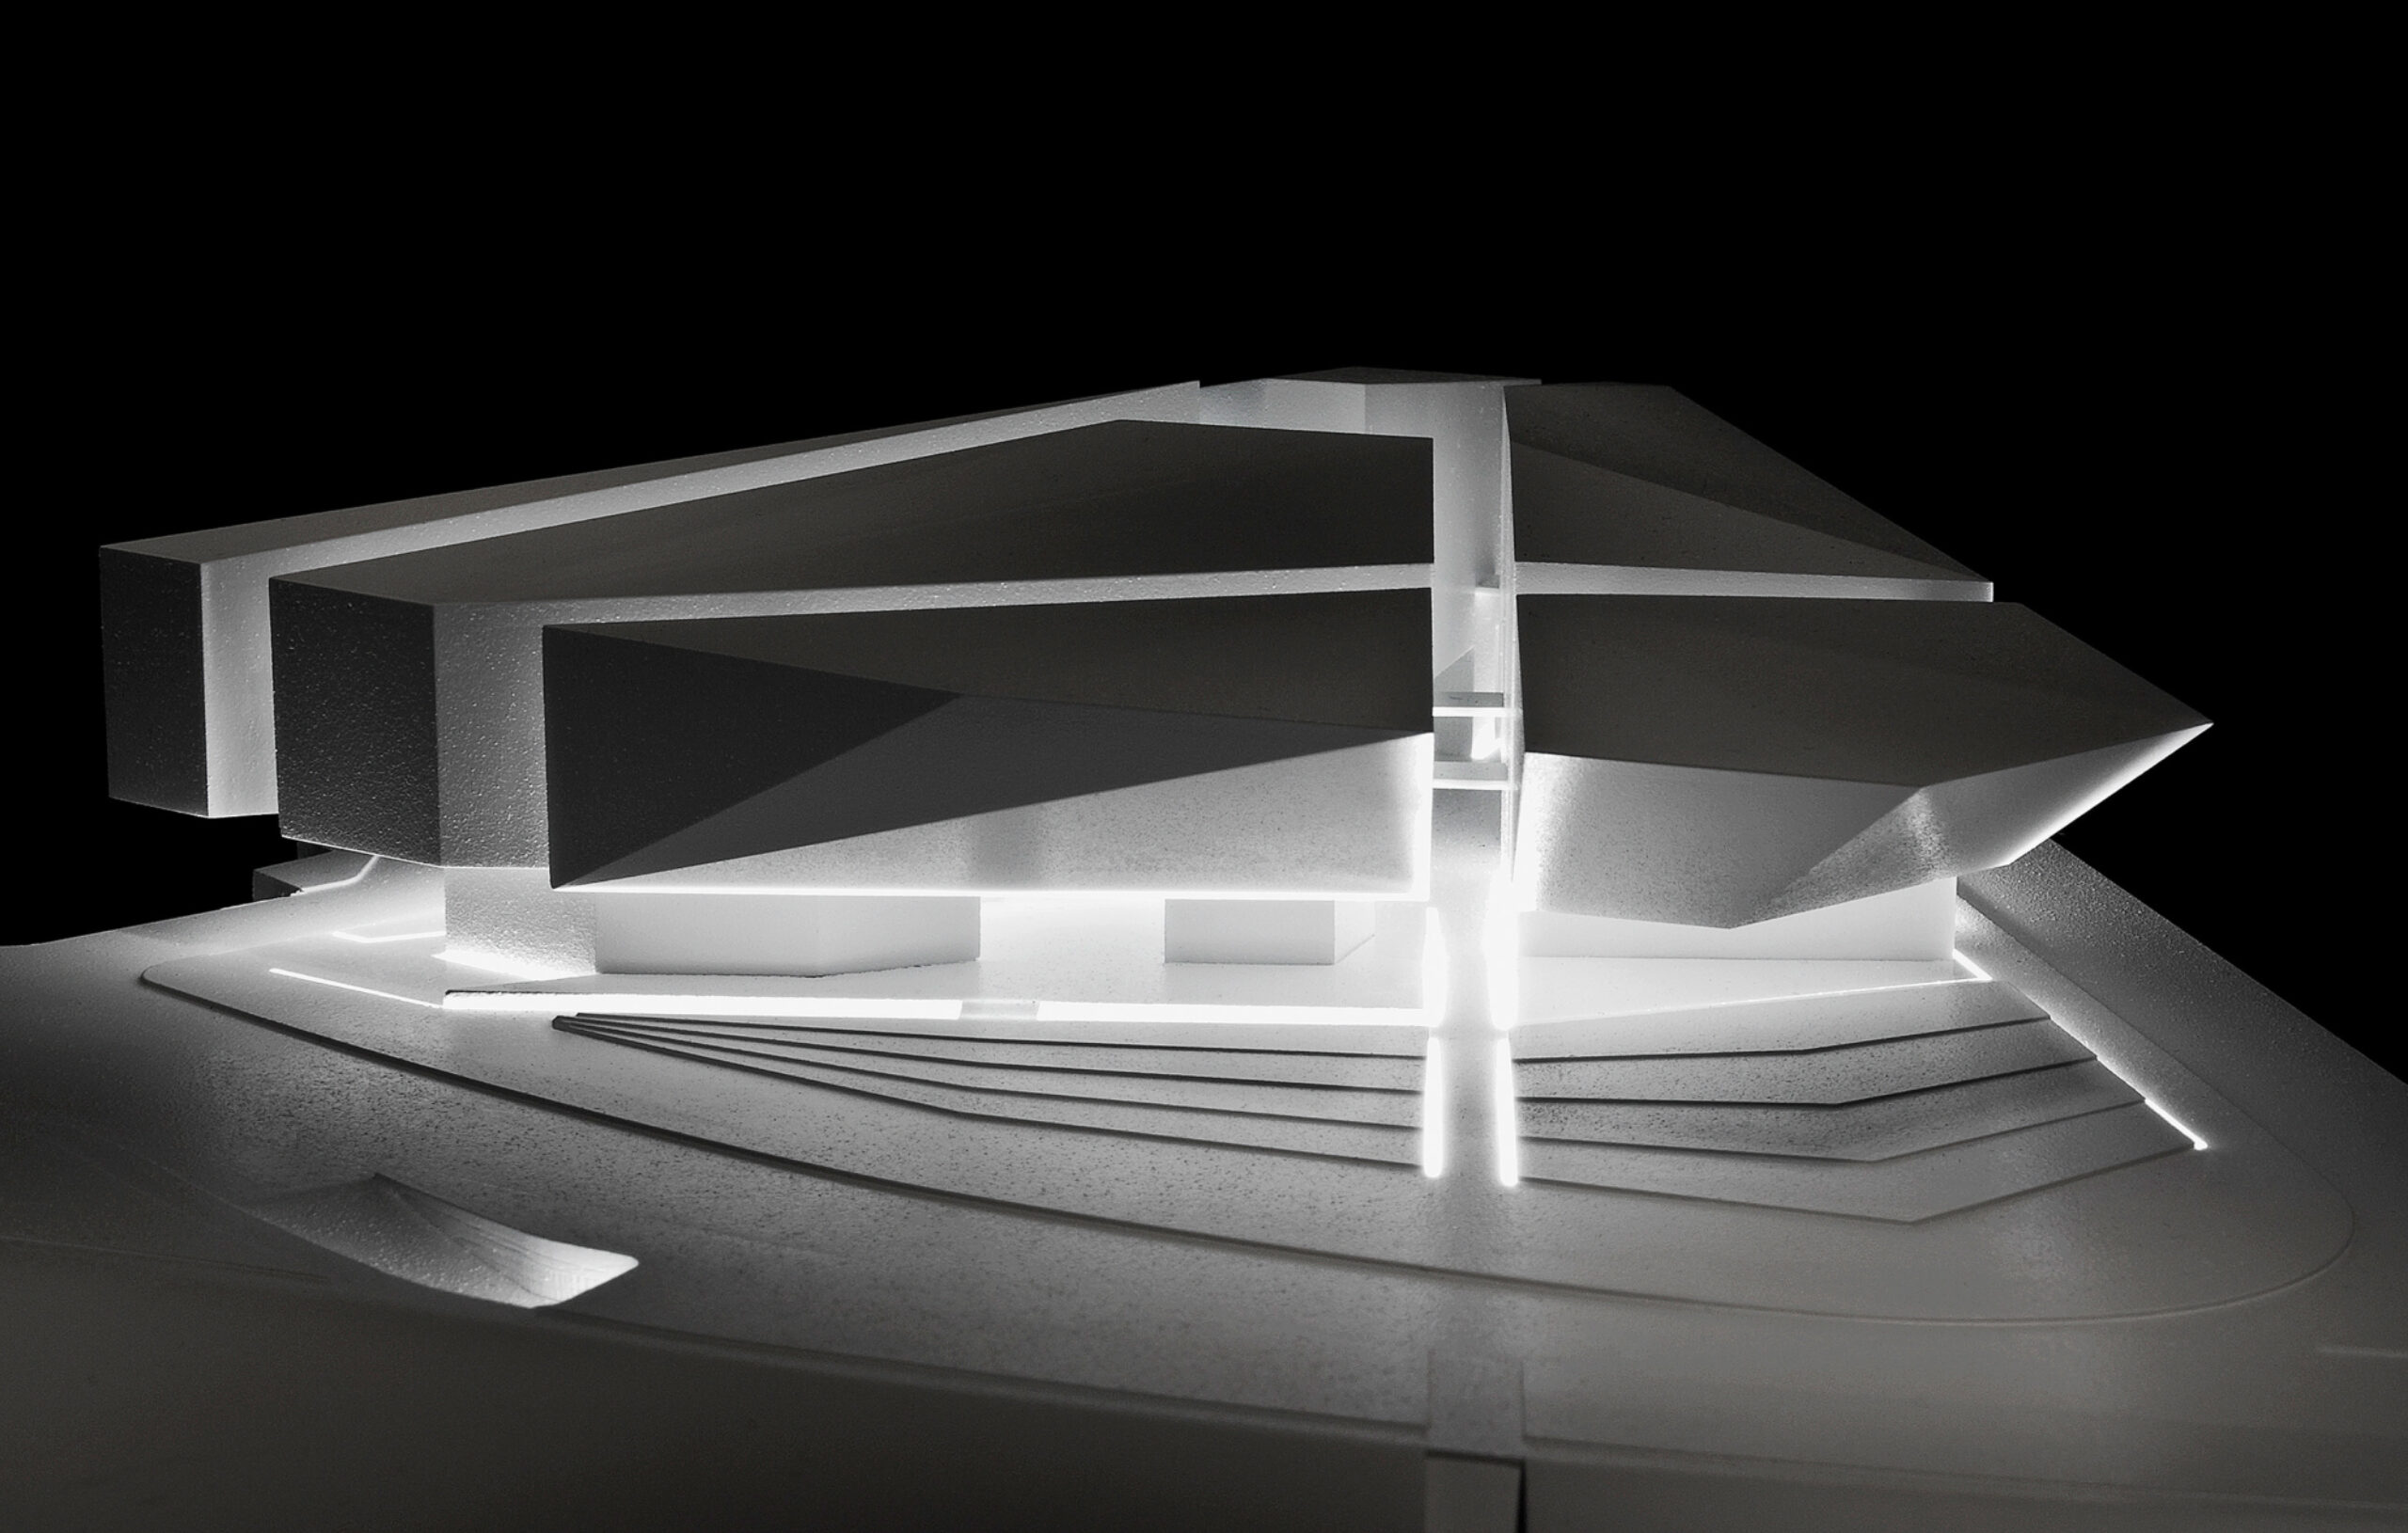 Neues Bauhaus Museum Weimar 02